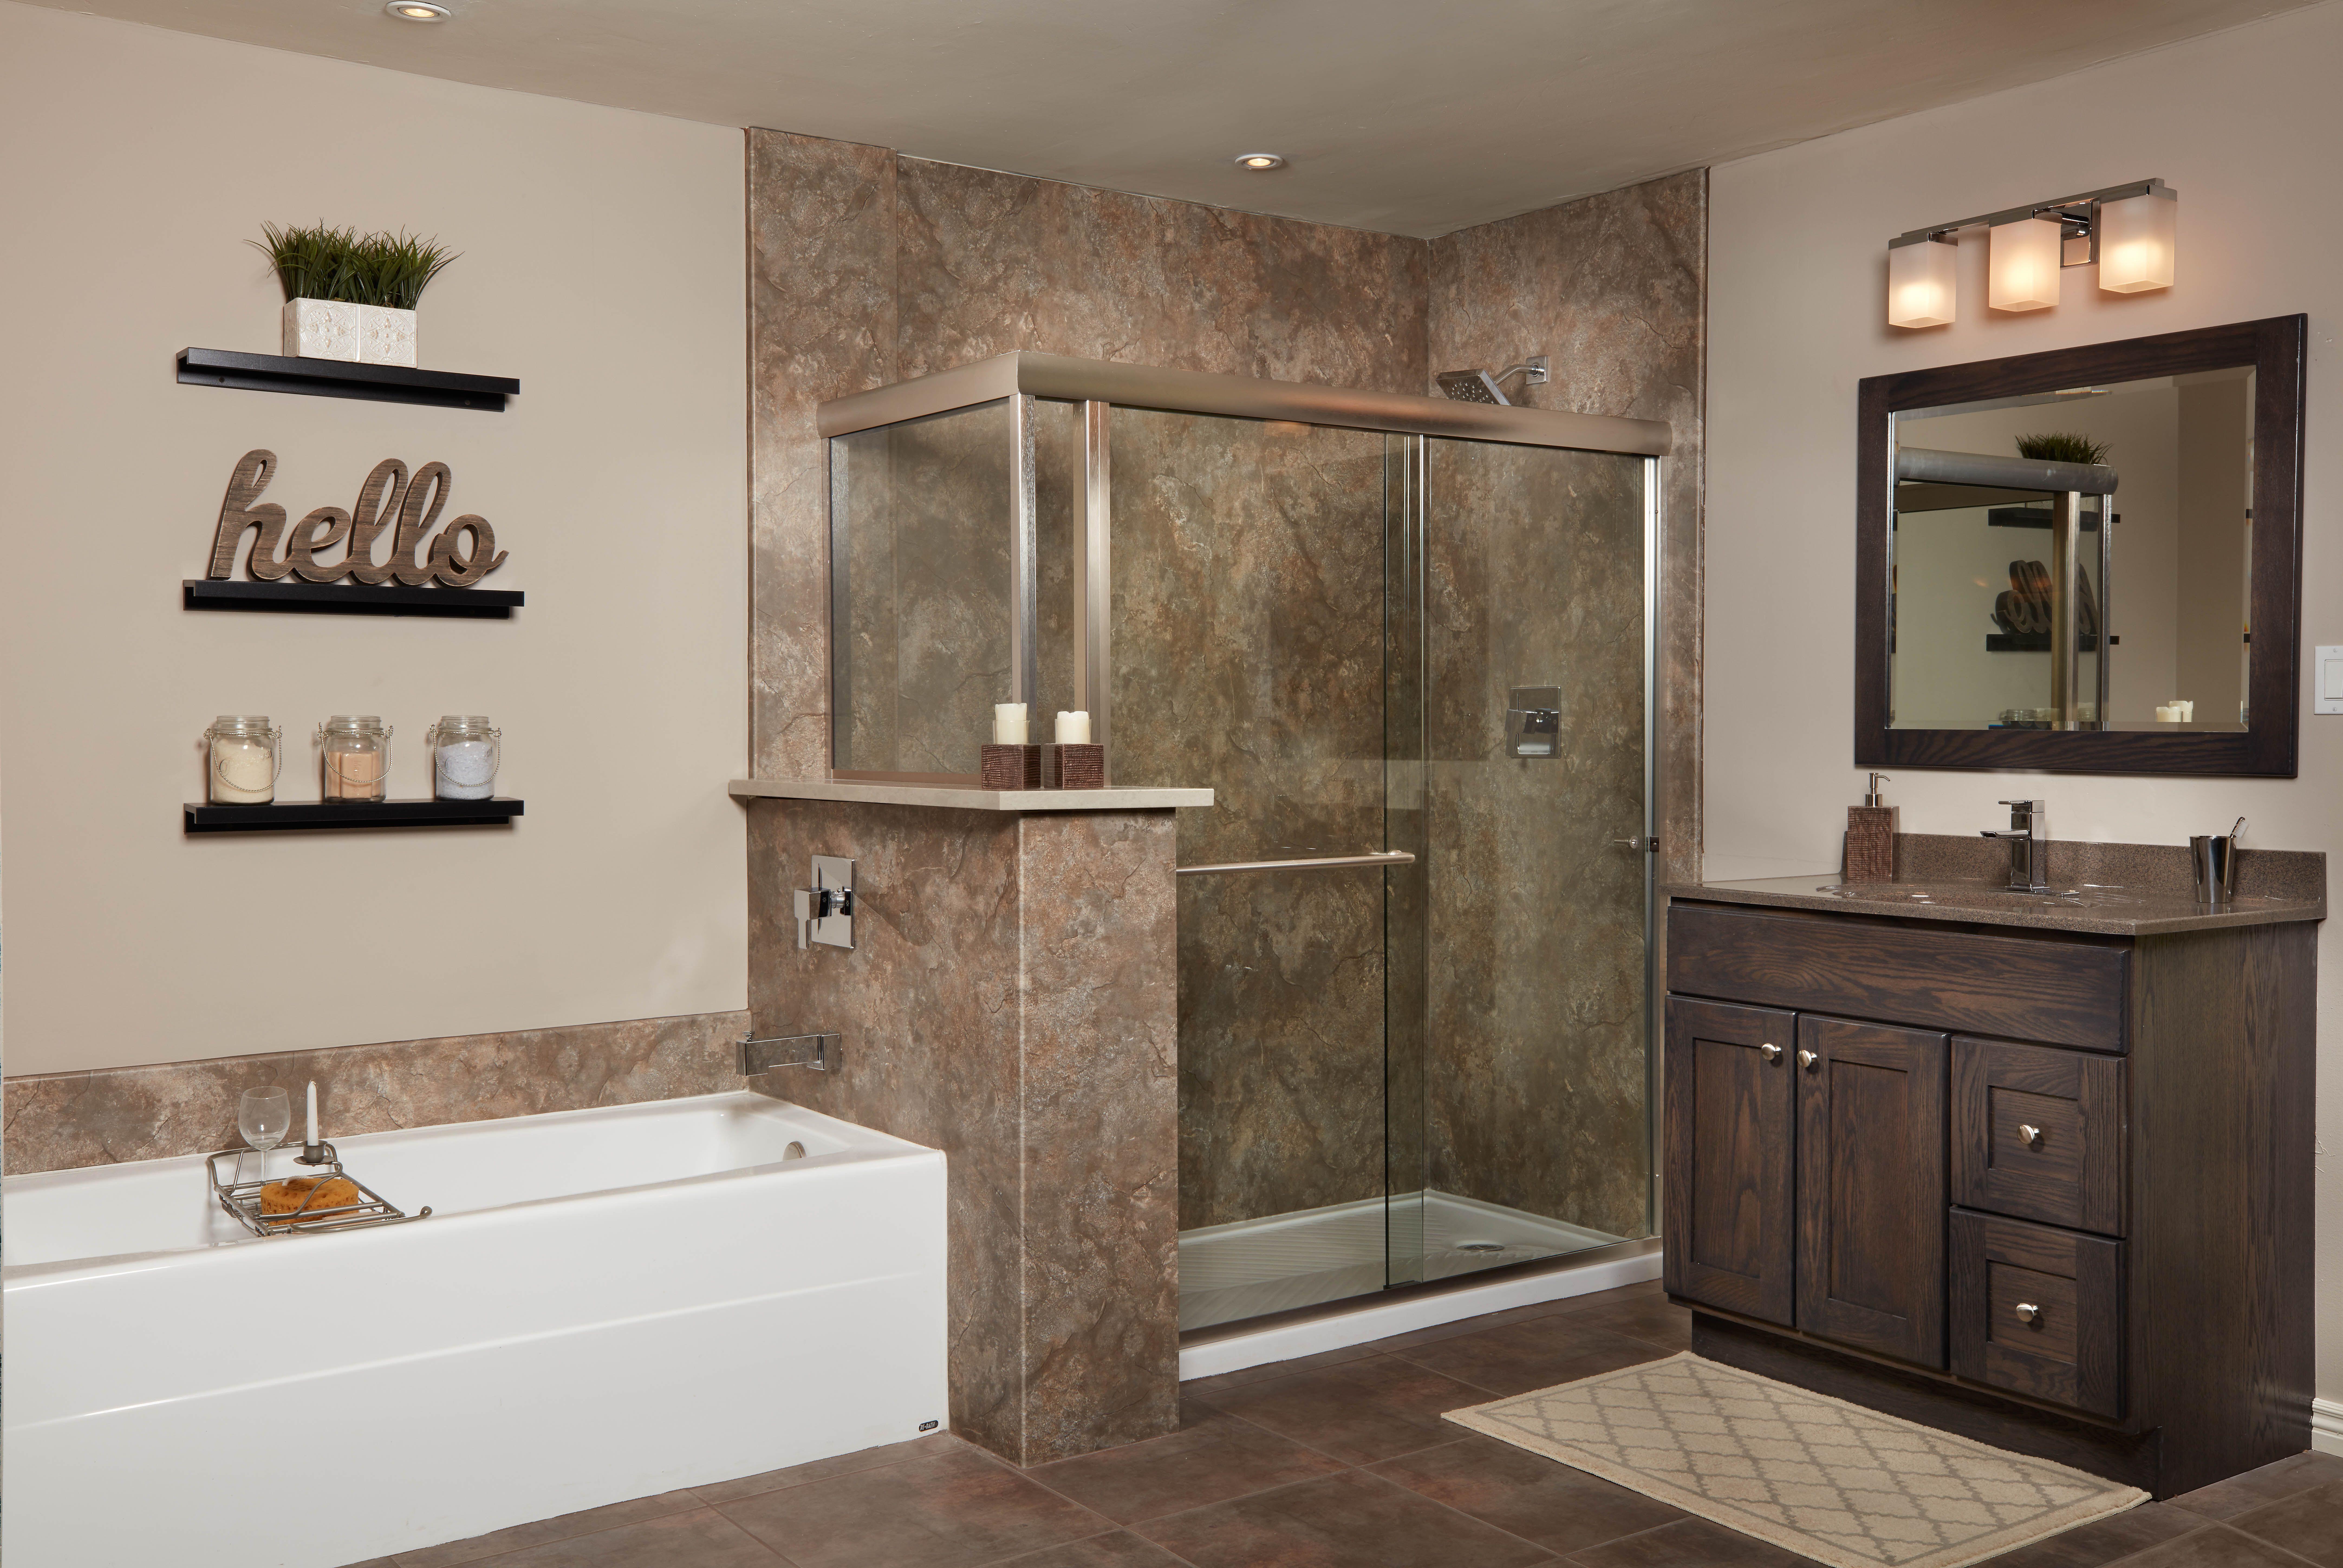 Desert Stone Shower Wall Surround Complete Bathroom Remodel Stone Shower Walls Bathrooms Remodel